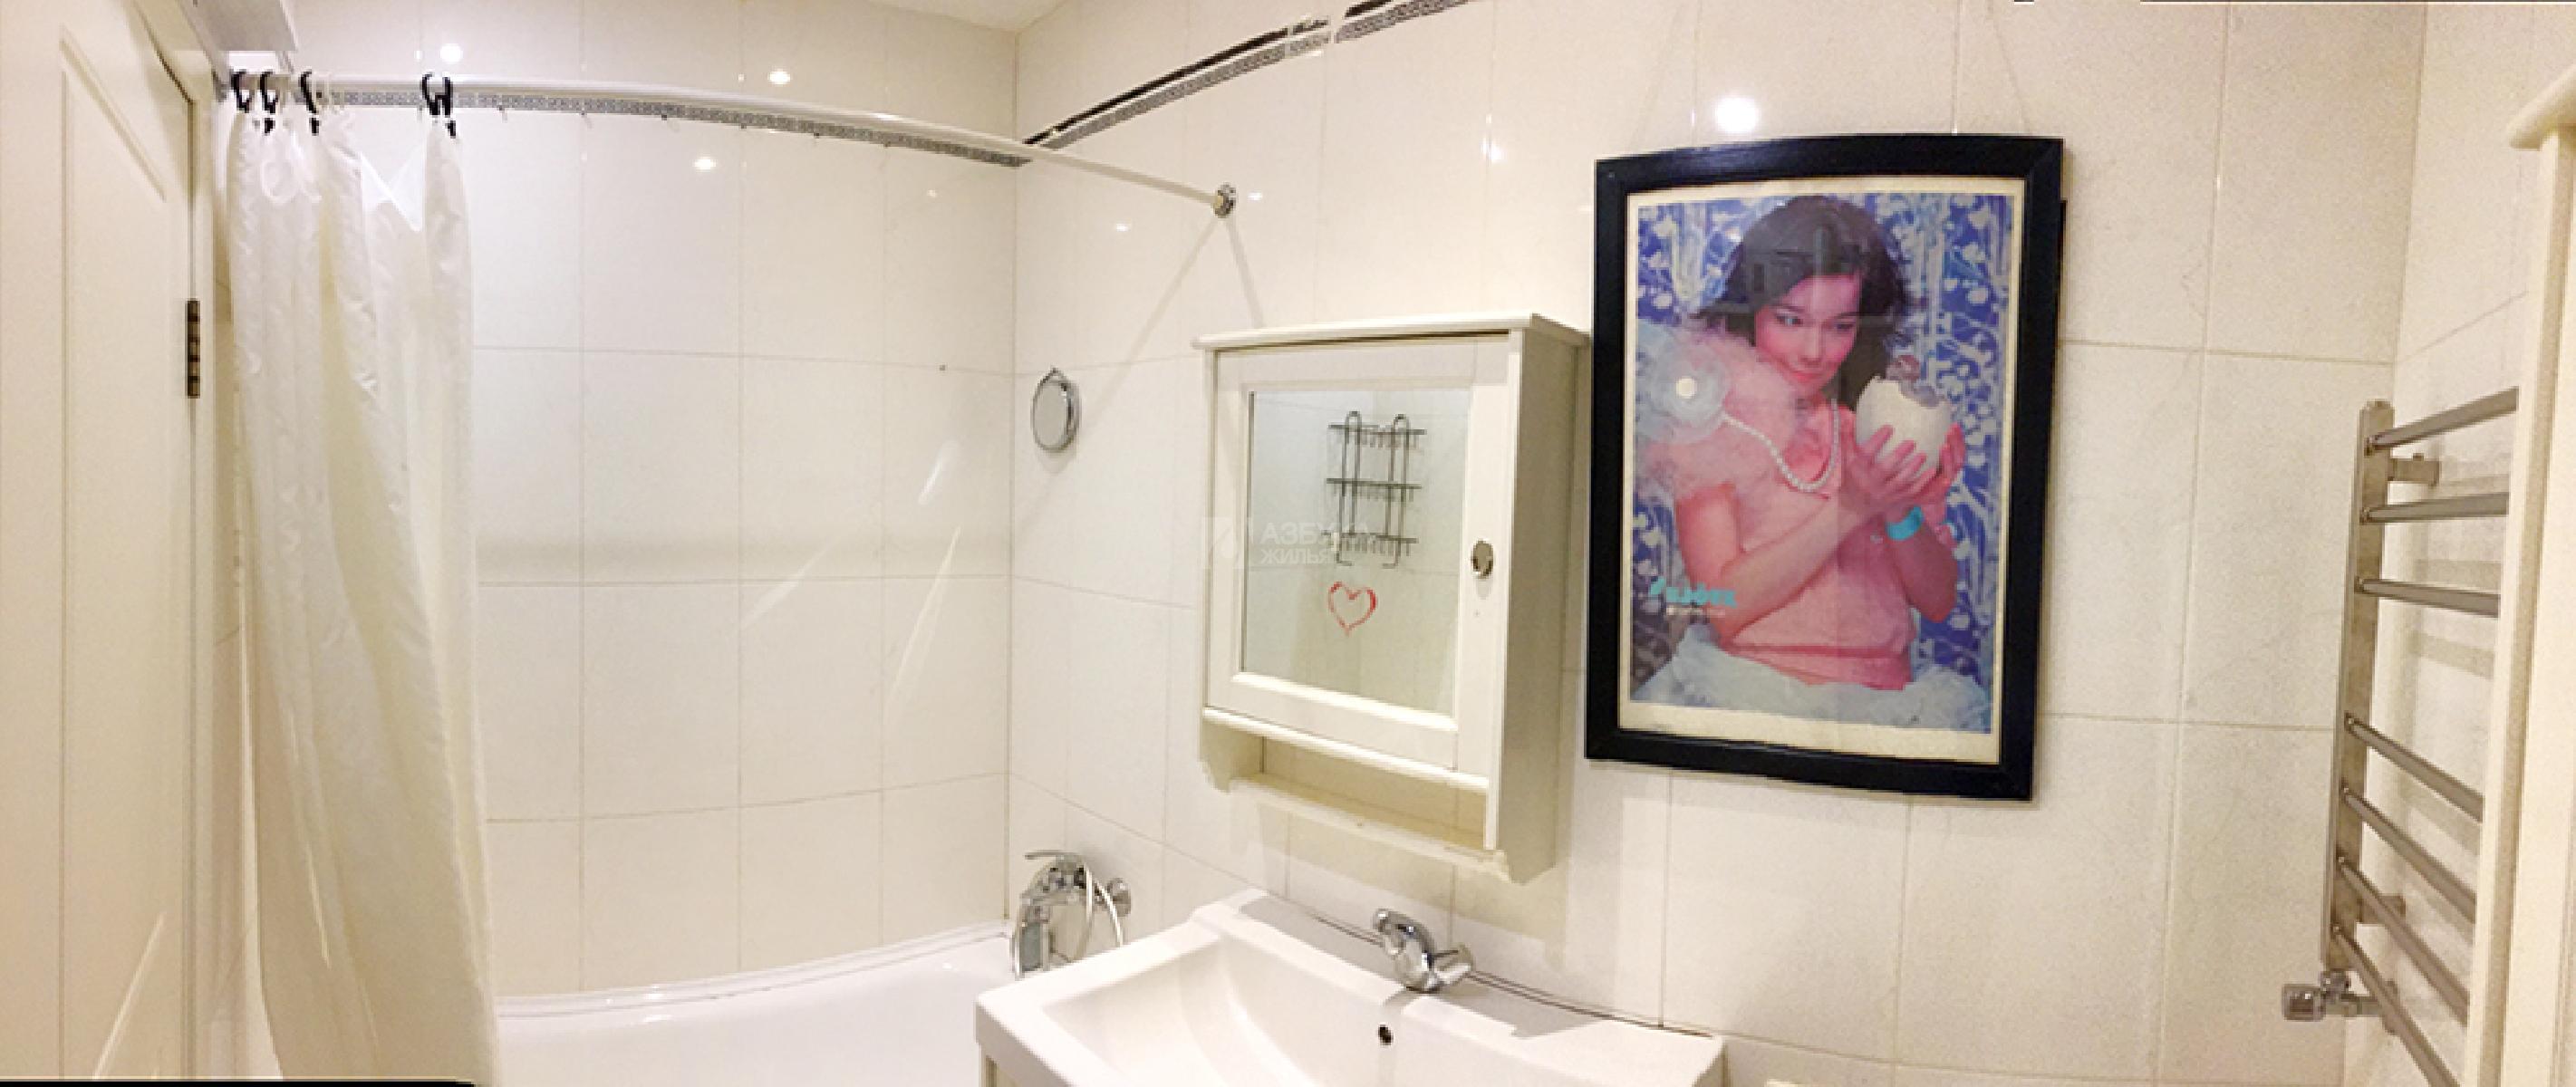 Фото №4 - 2-комнатная квартира, Москва, Комсомольский проспект 14/1 корпус 2, метро Парк культуры